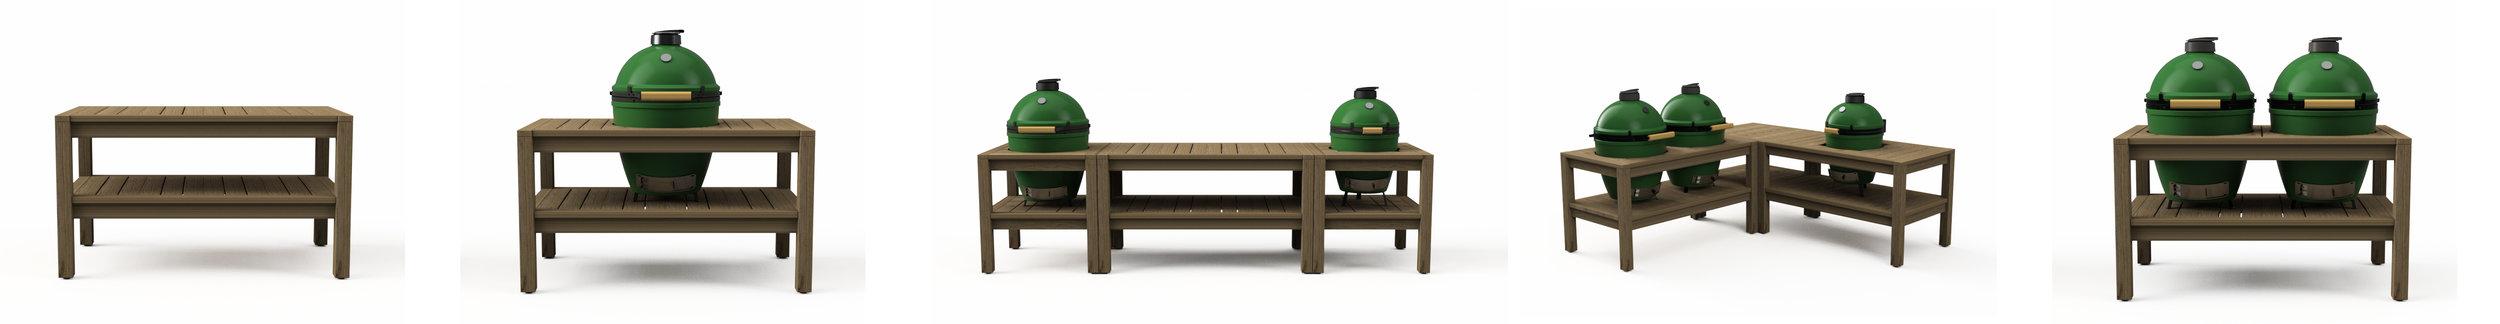 modular wood rendered sequence.jpg